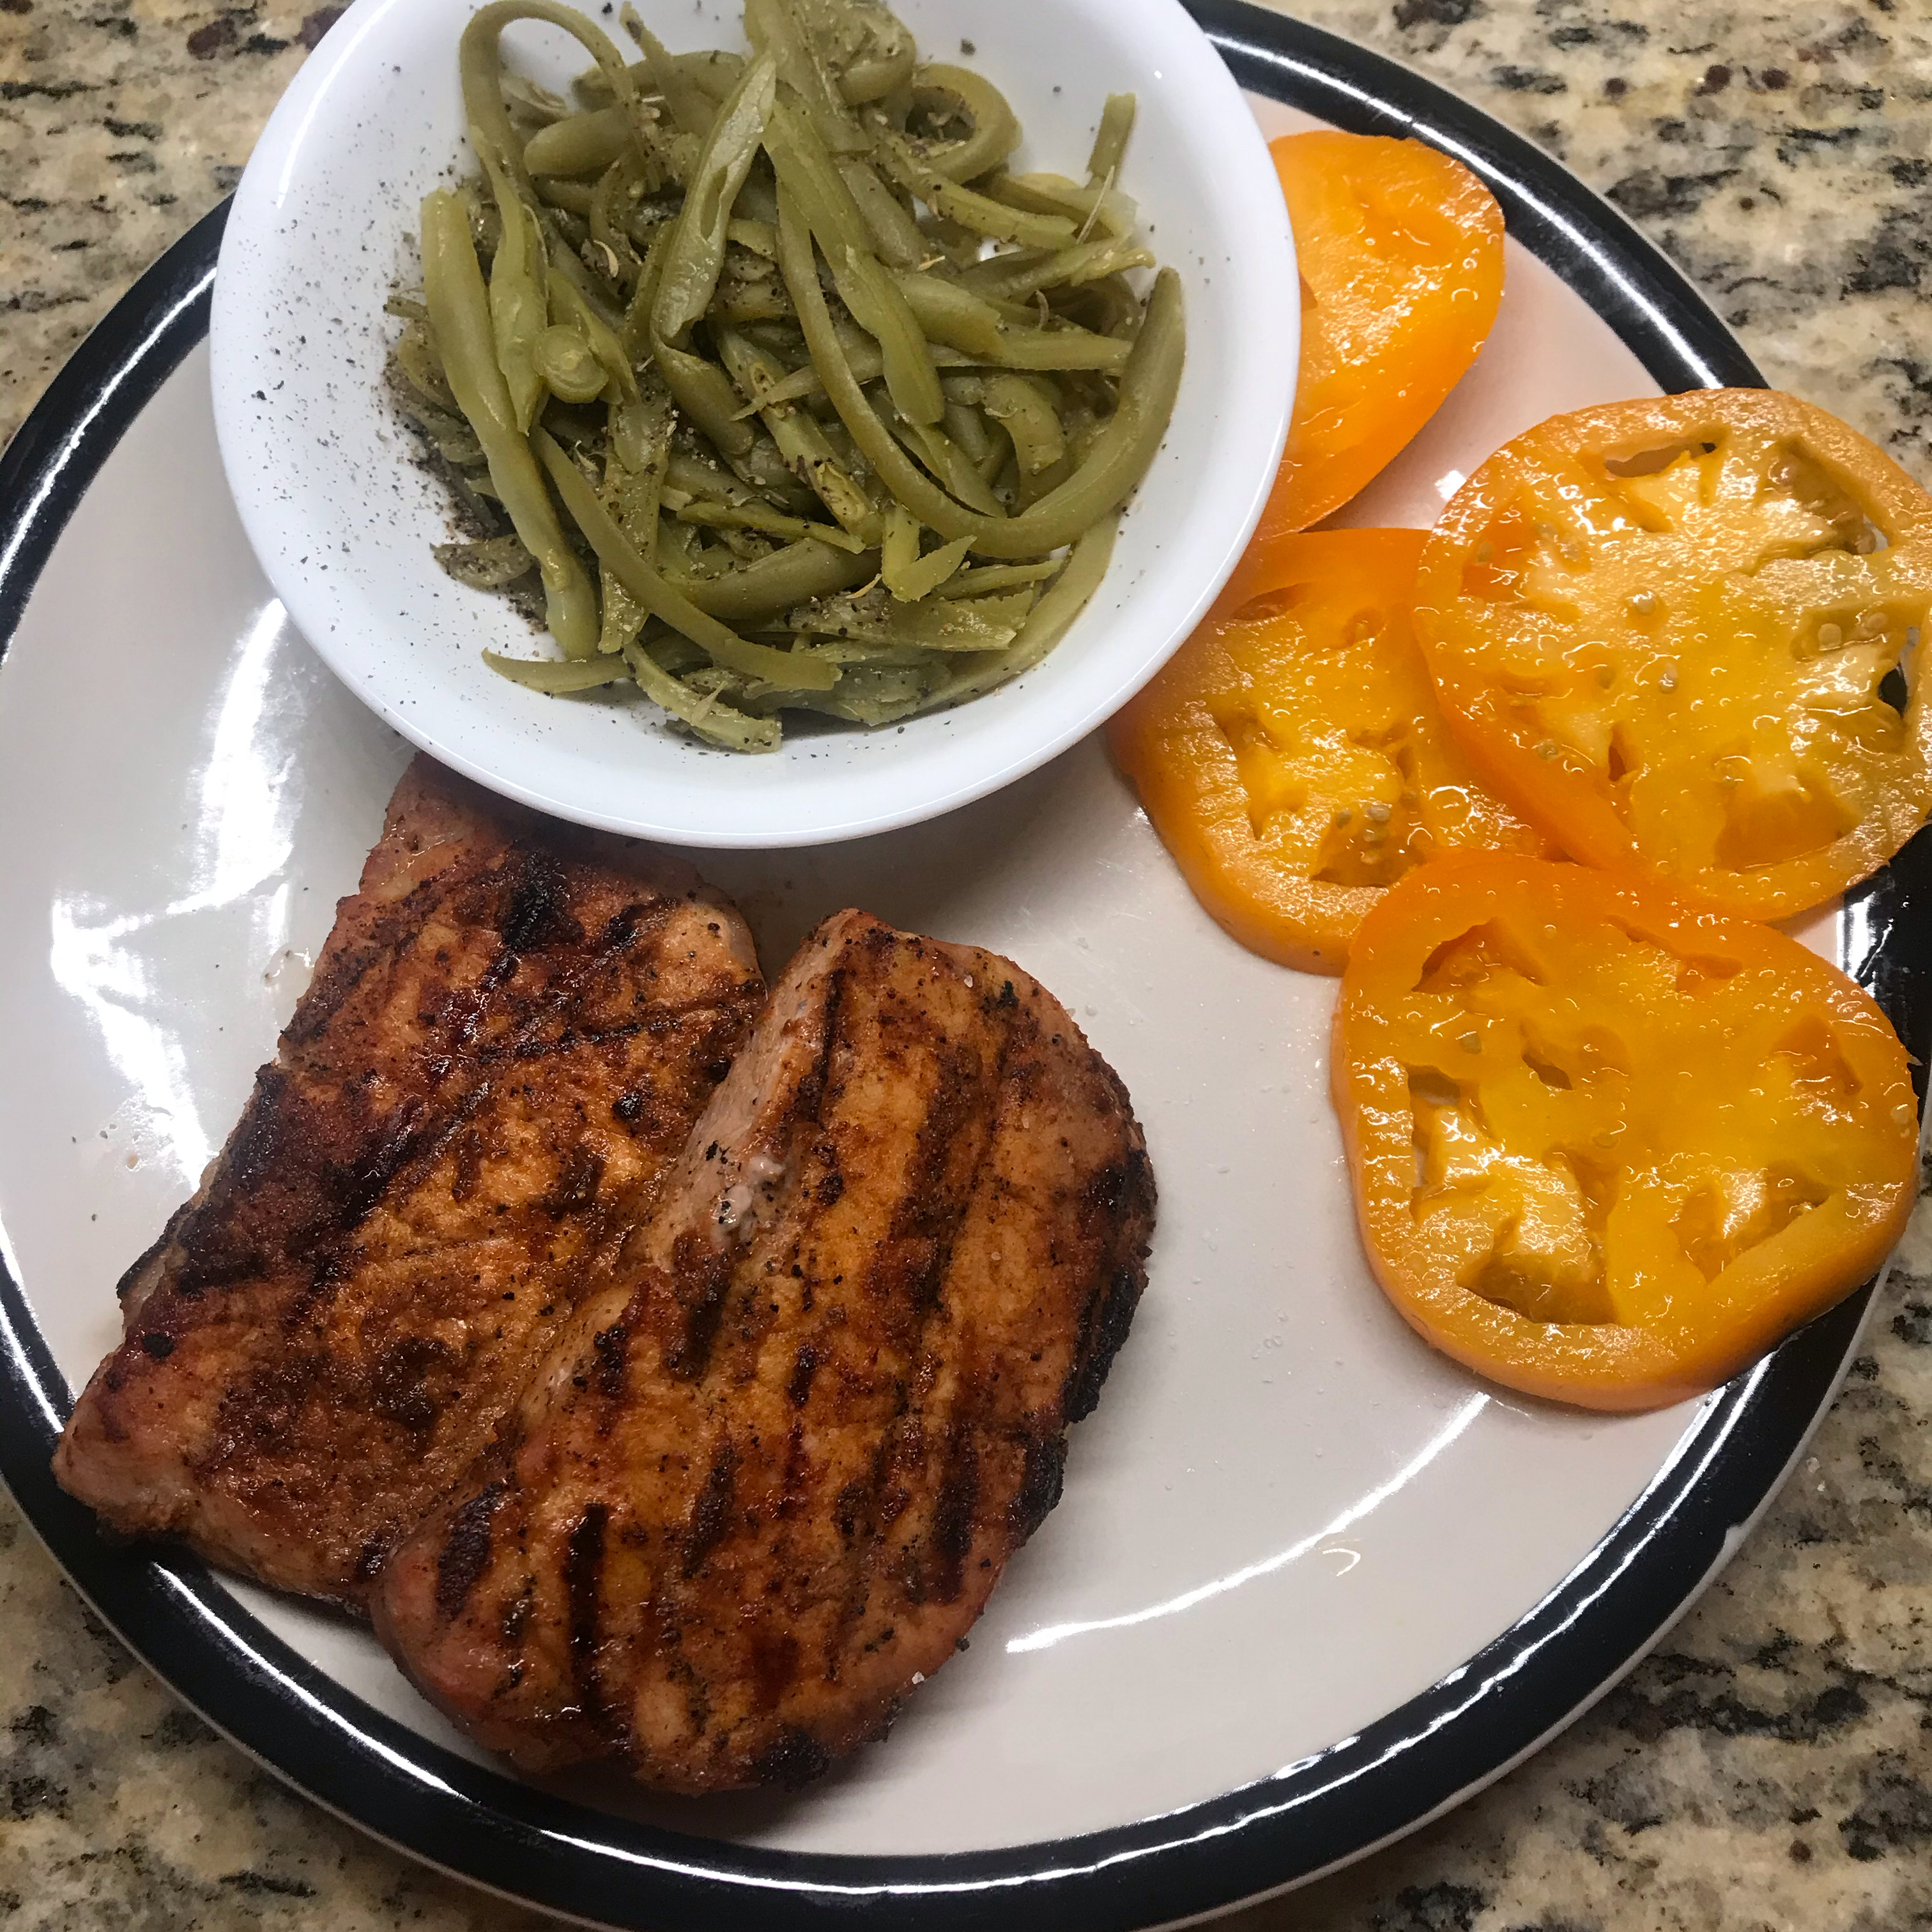 Smoky Grilled Pork Chops